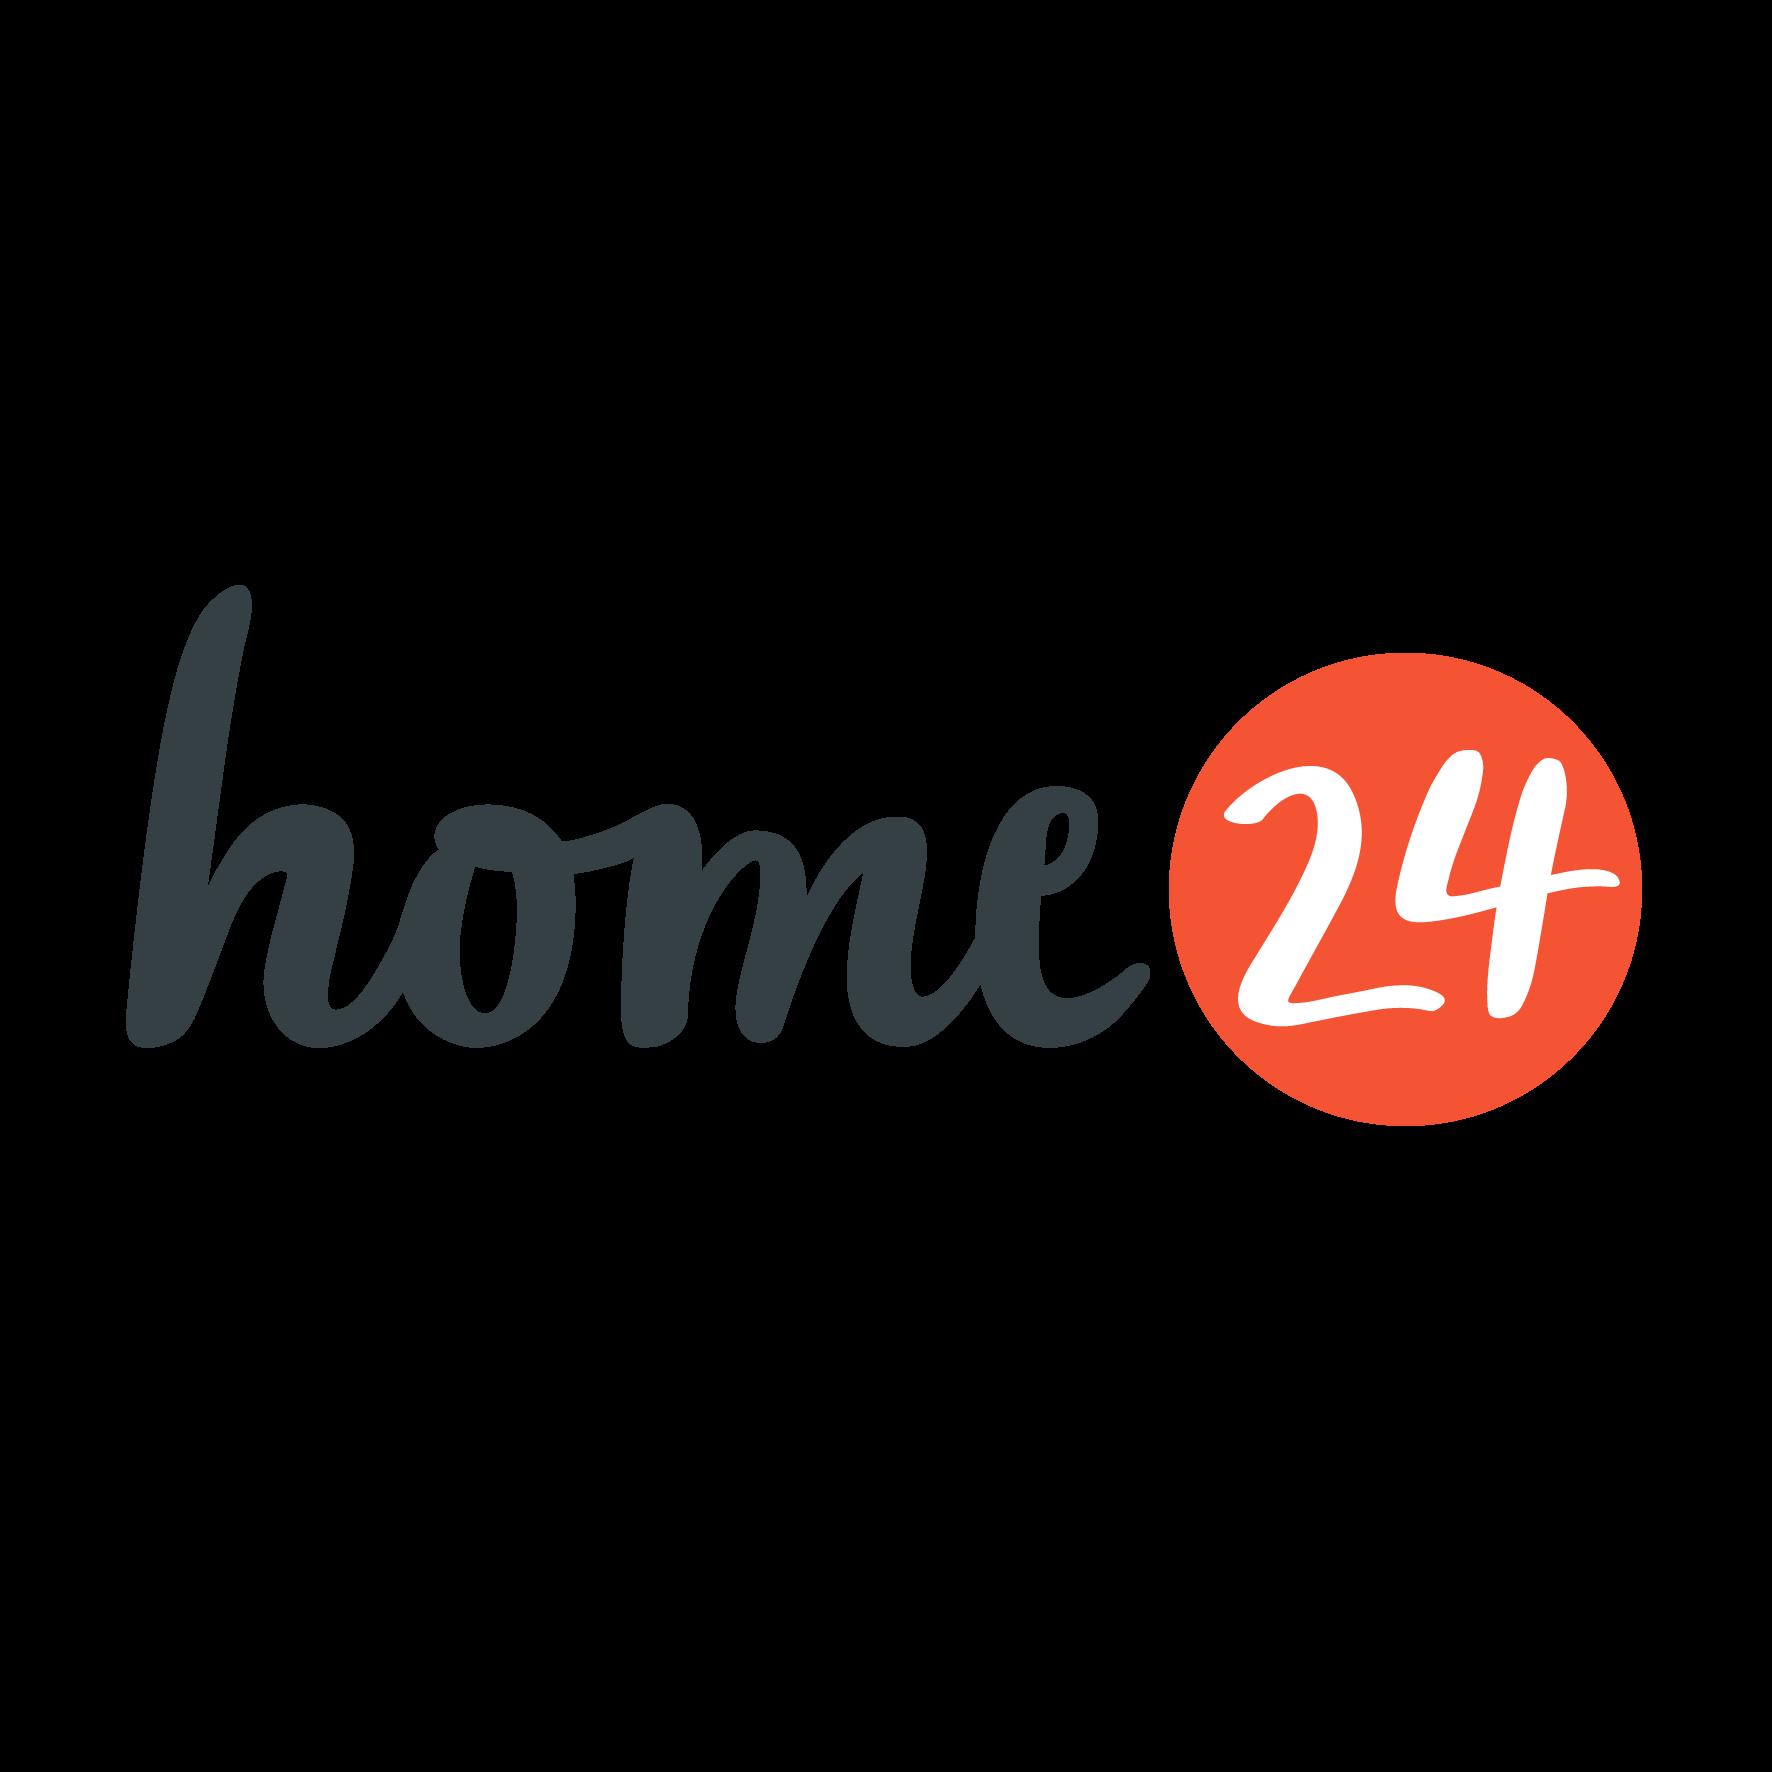 Avis Sur Le Site Home24 home24 reviews | read customer service reviews of www.home24.ch